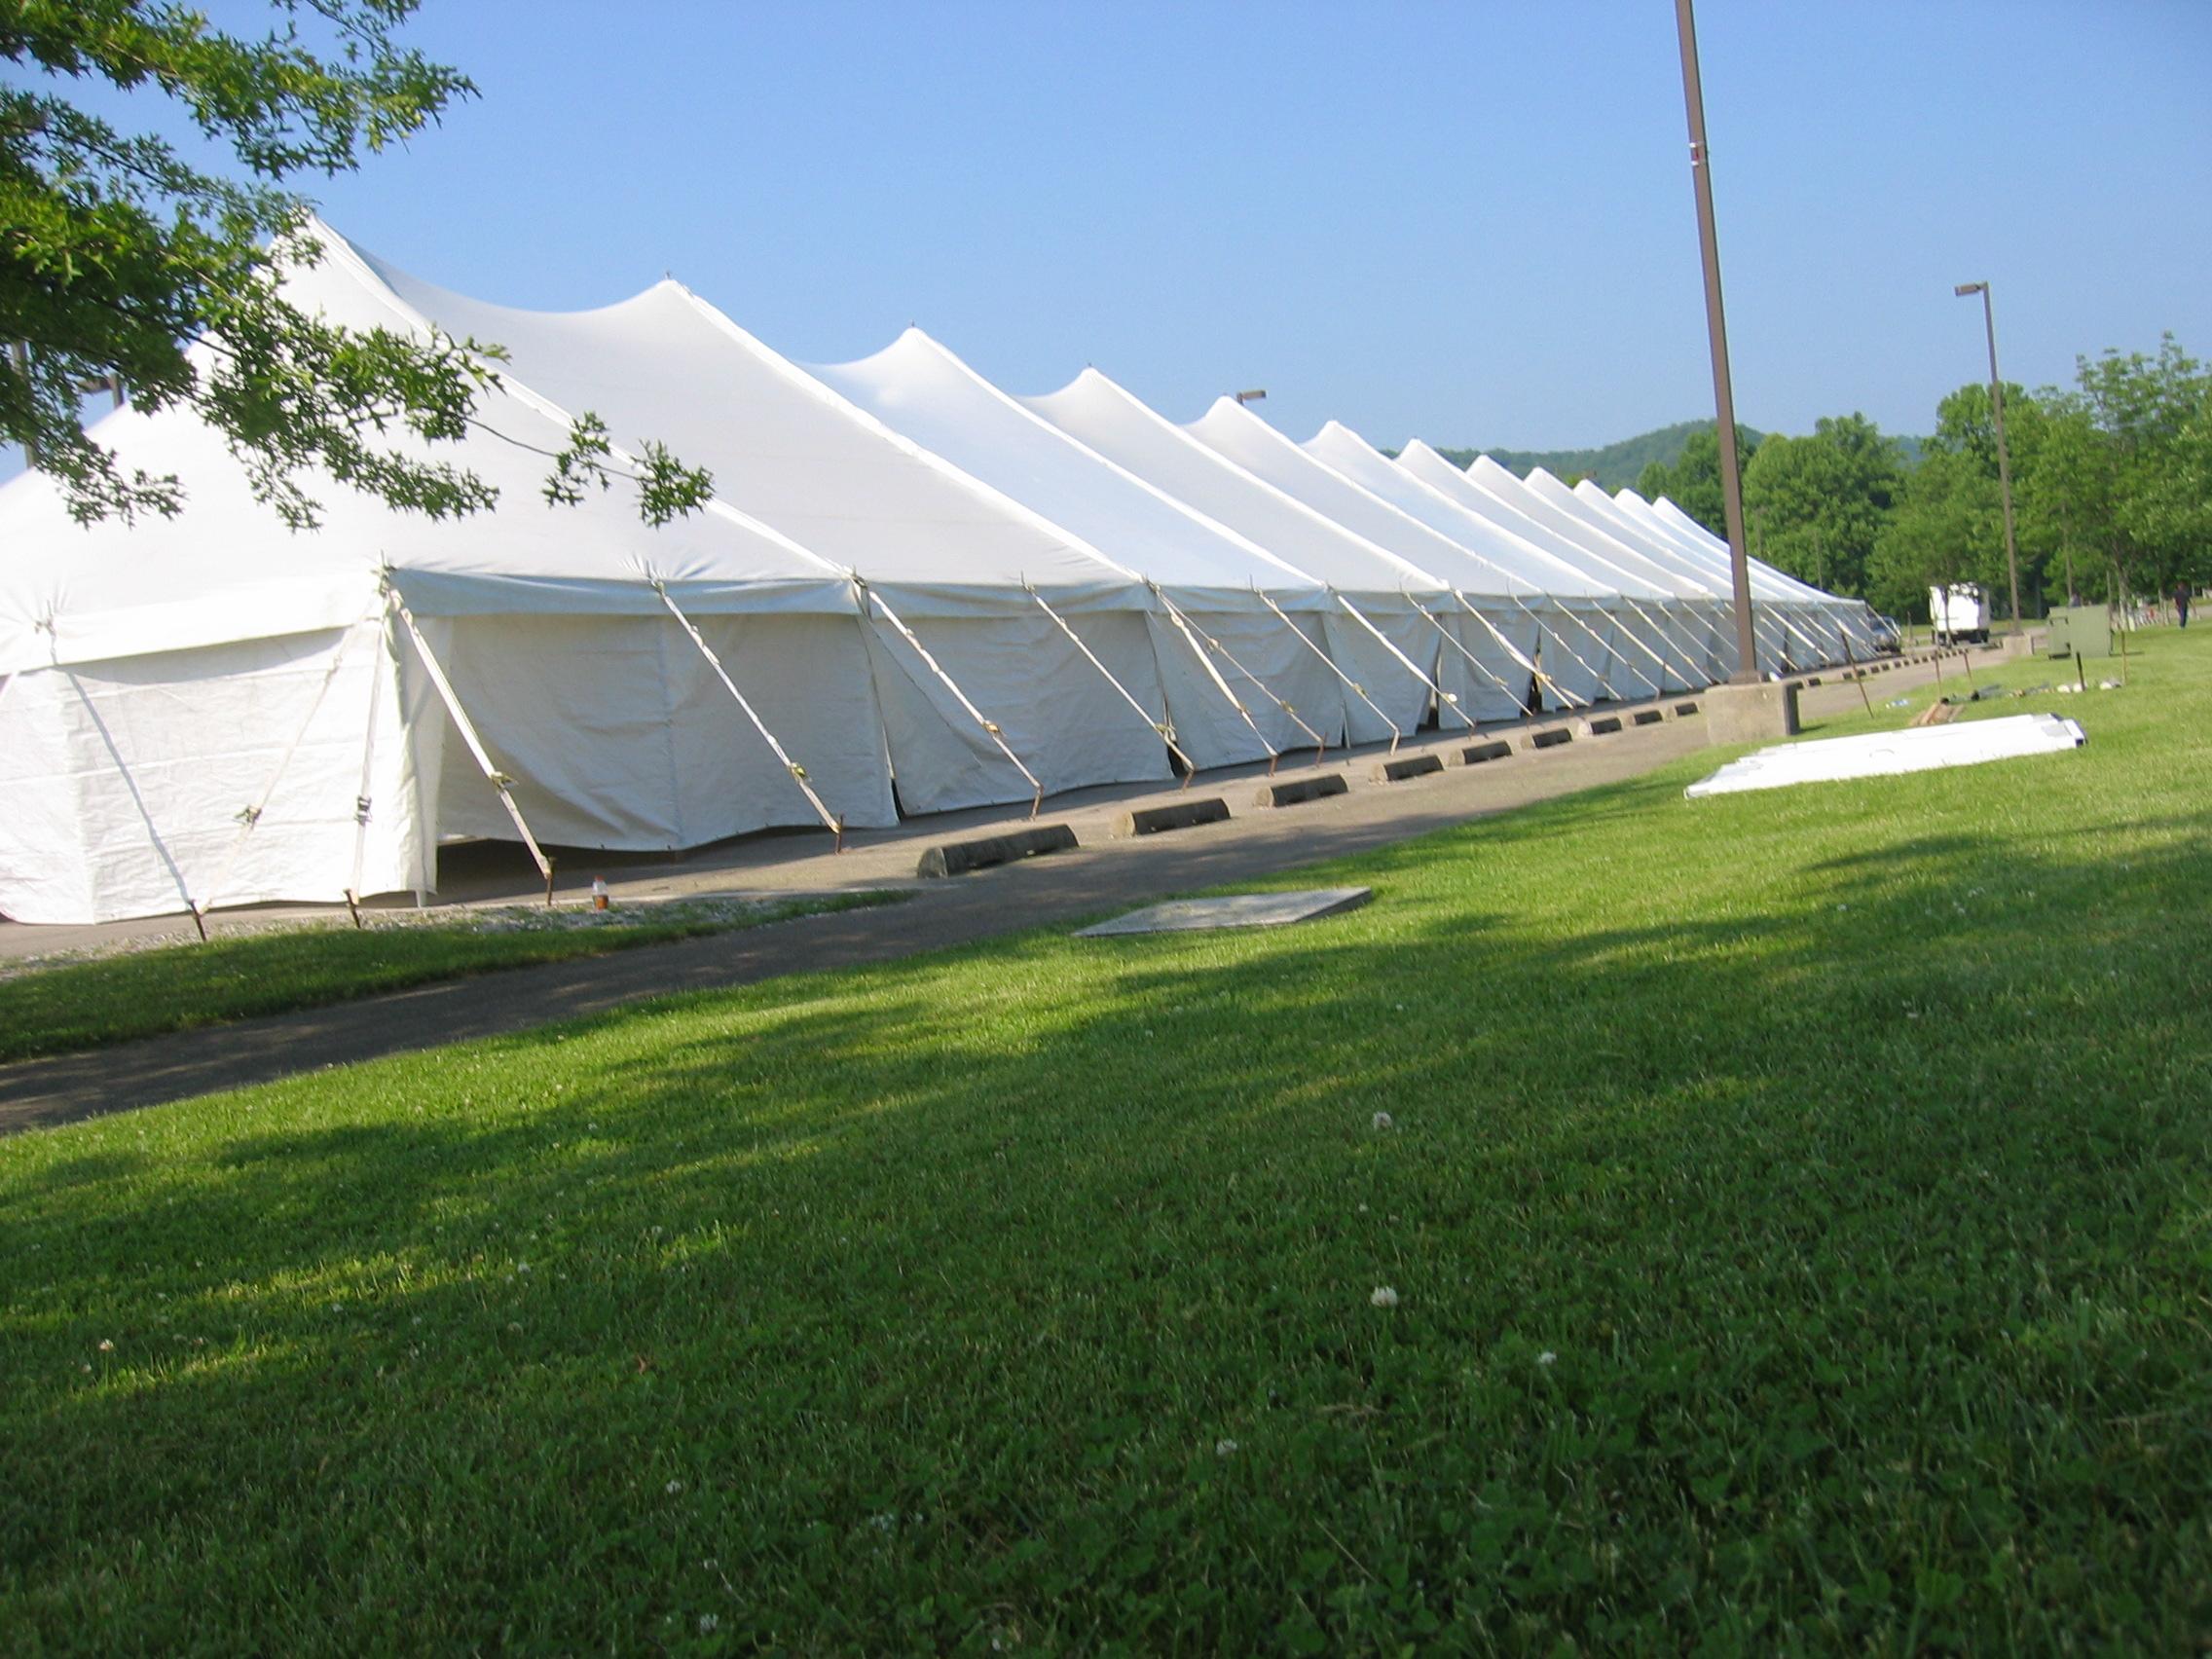 pole-tent-240-1-2